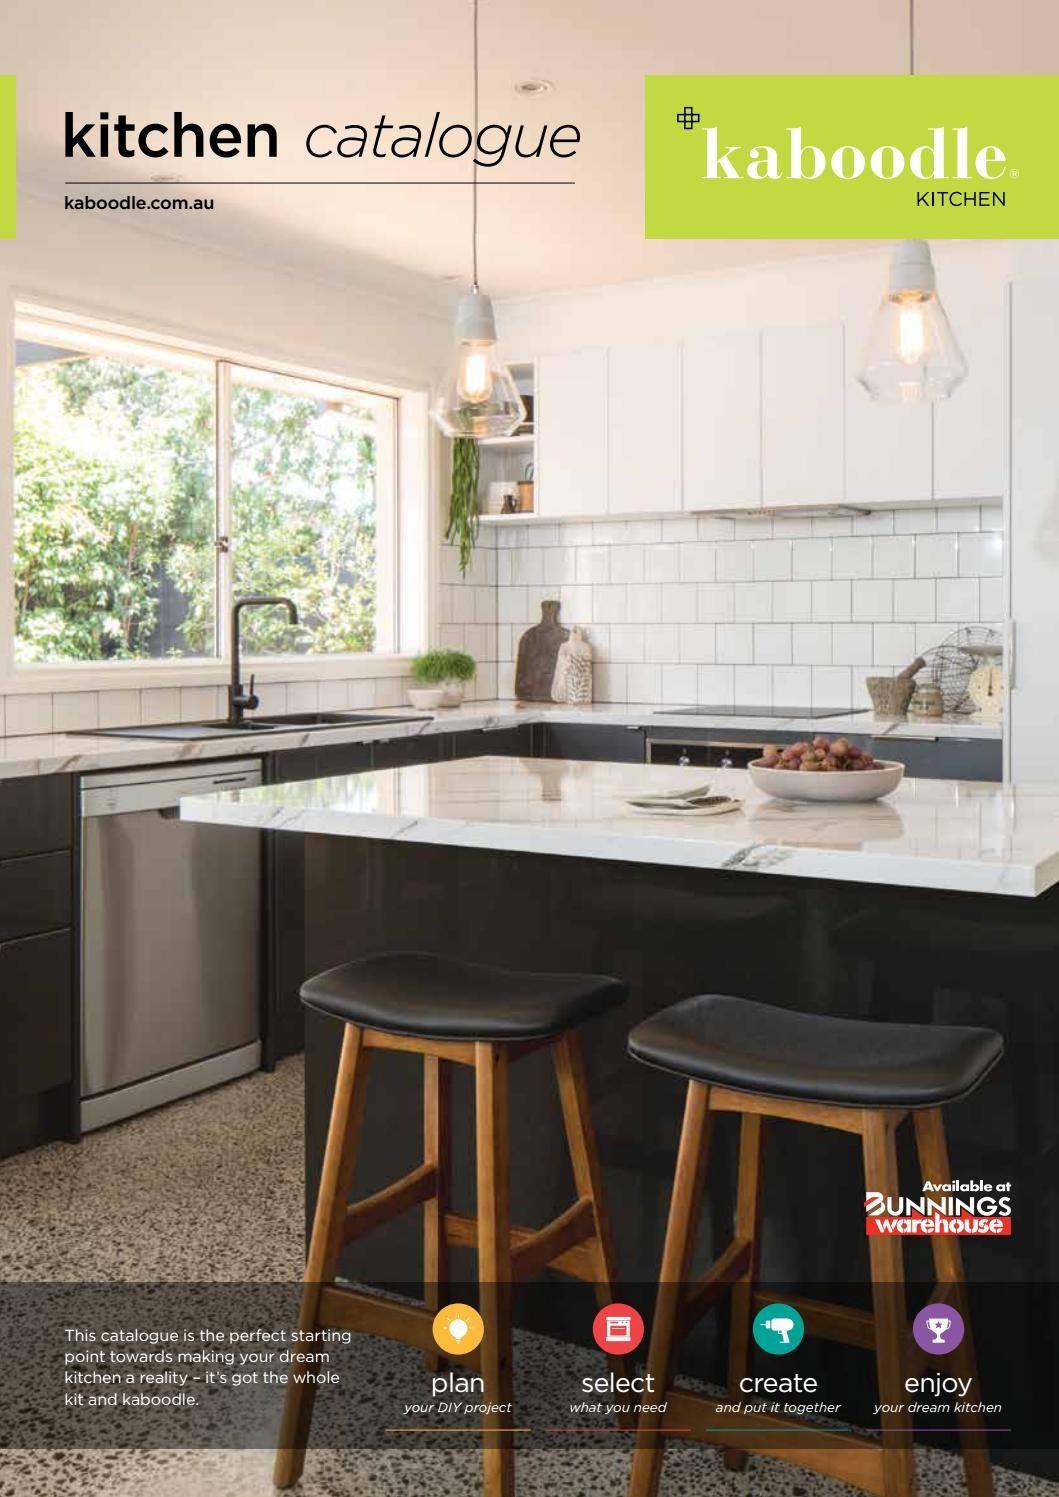 kaboodle kitchen australian catalogue kitchen kitchen renovation kaboodle on kaboodle kitchen layout id=97435